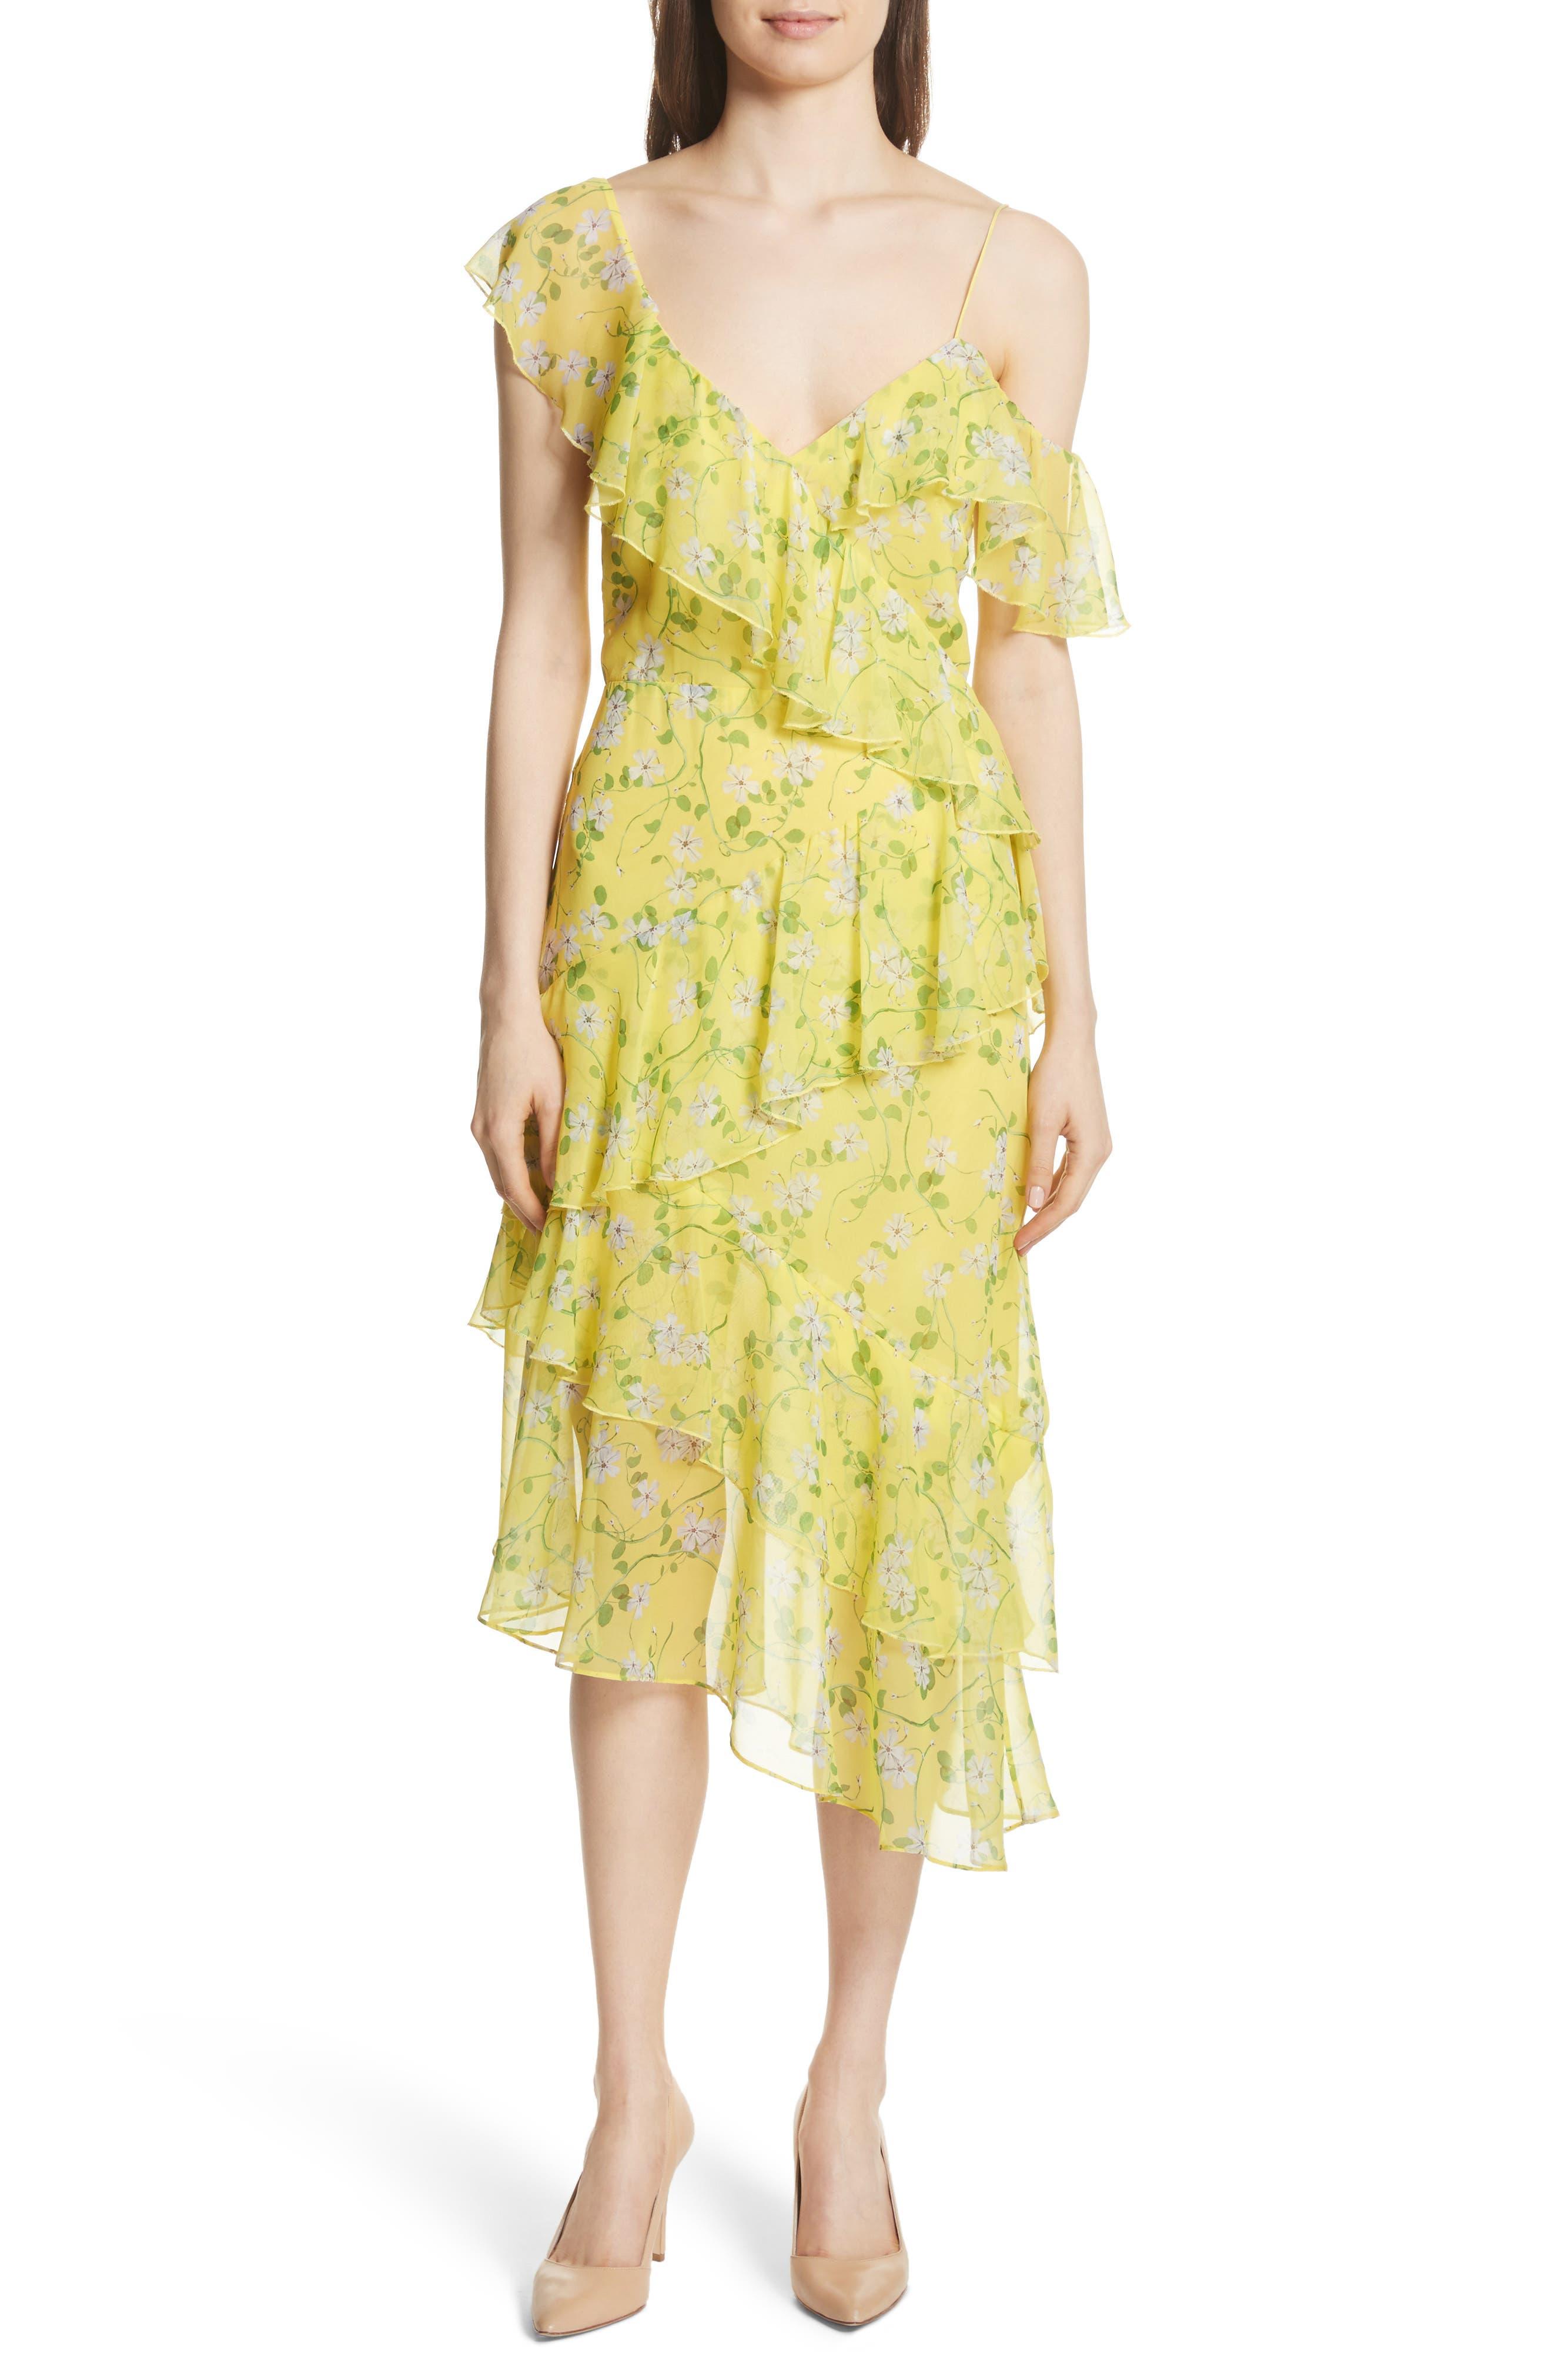 Alternate Image 1 Selected - Alice + Olivia Olympia Asymmetrical Print Silk Dress